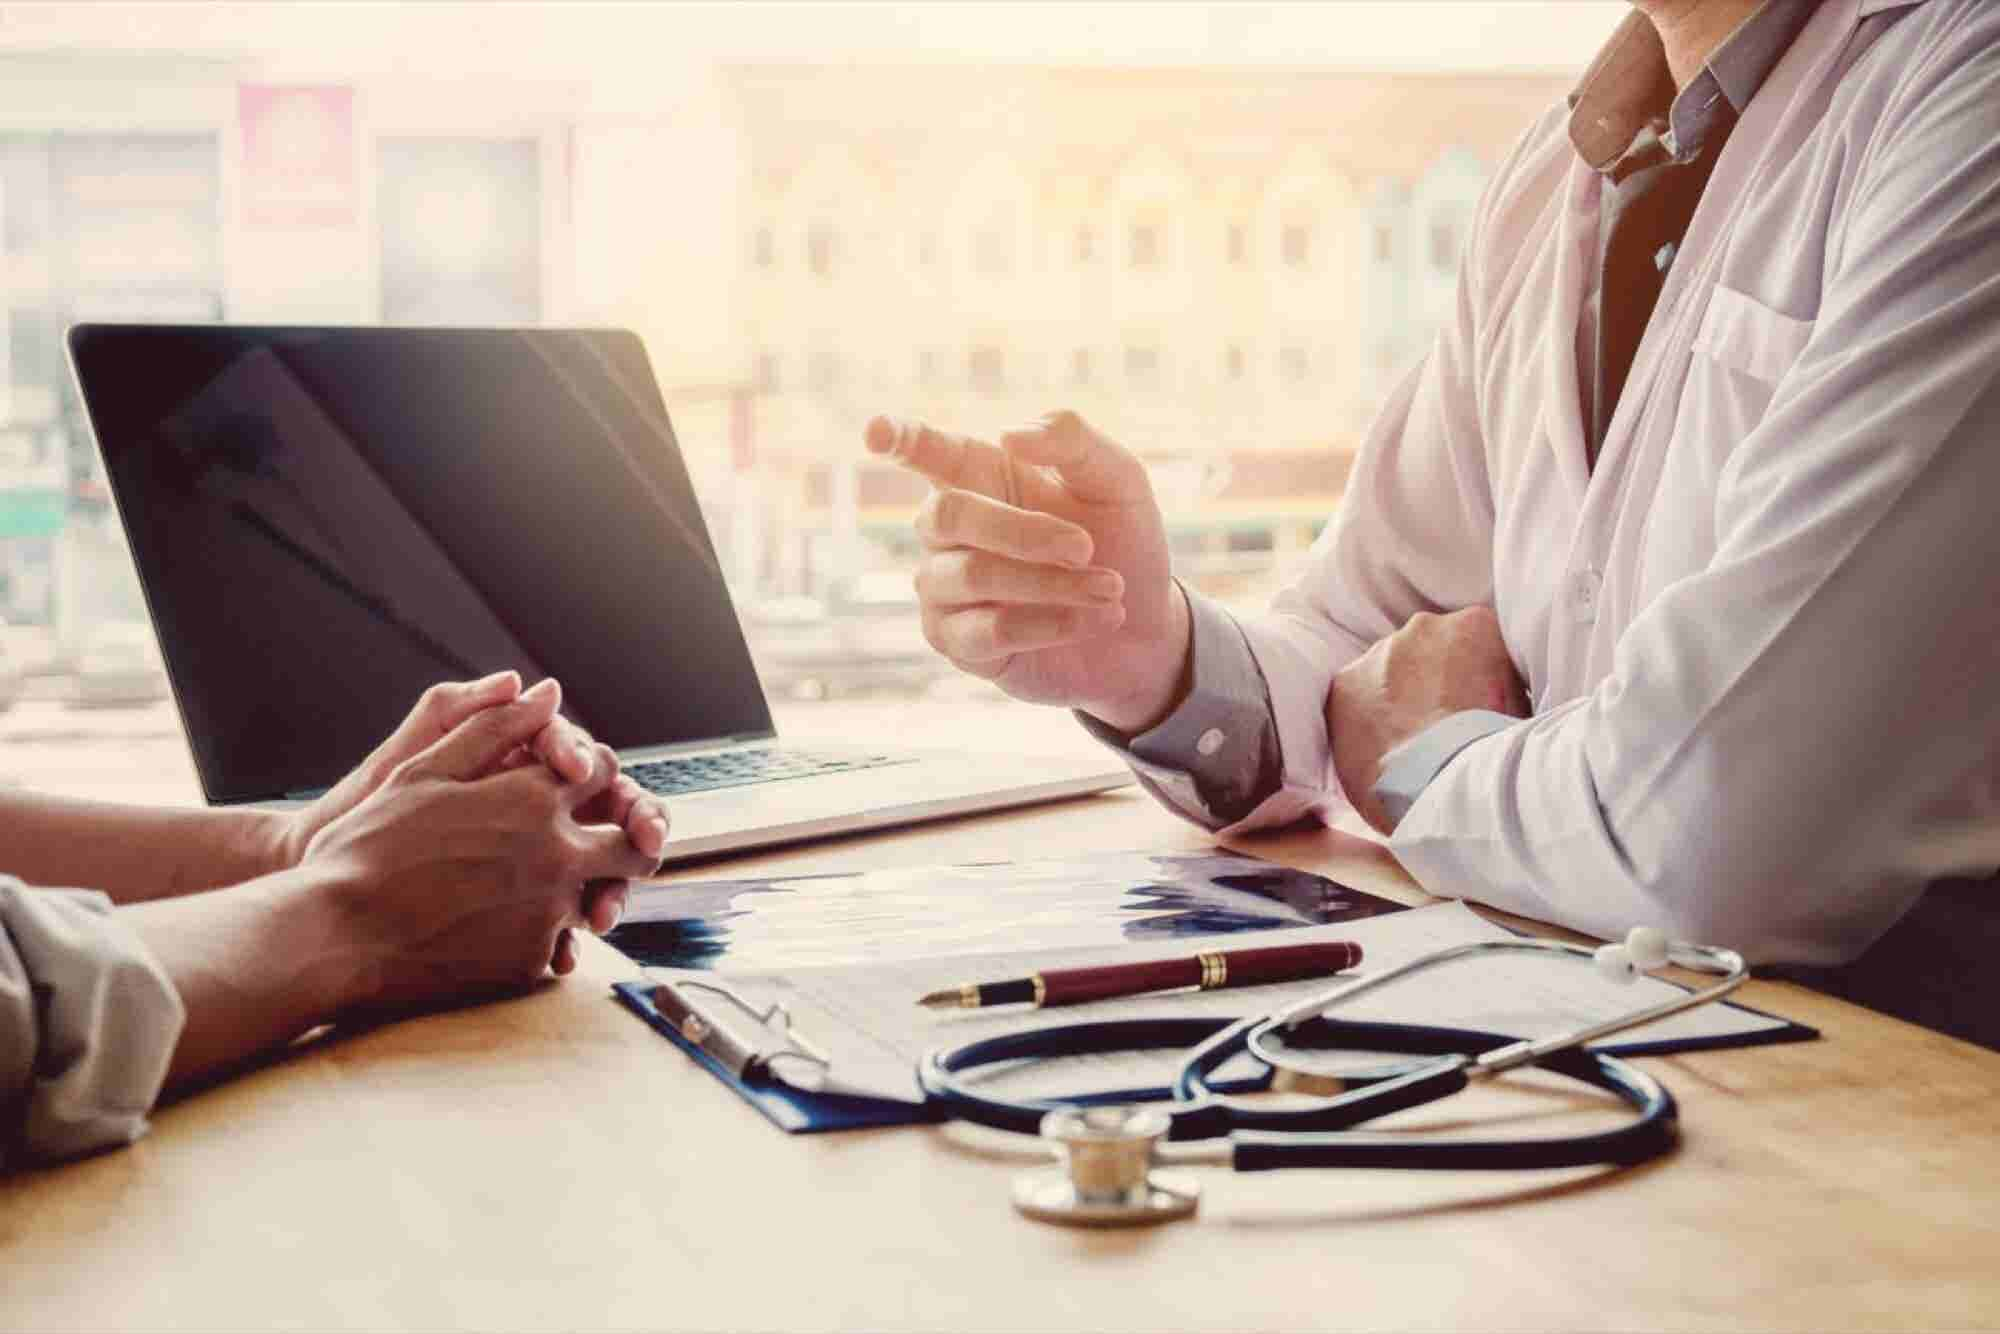 You Can Cut Employee Health Insurance Costs the Same Way Big Companies...